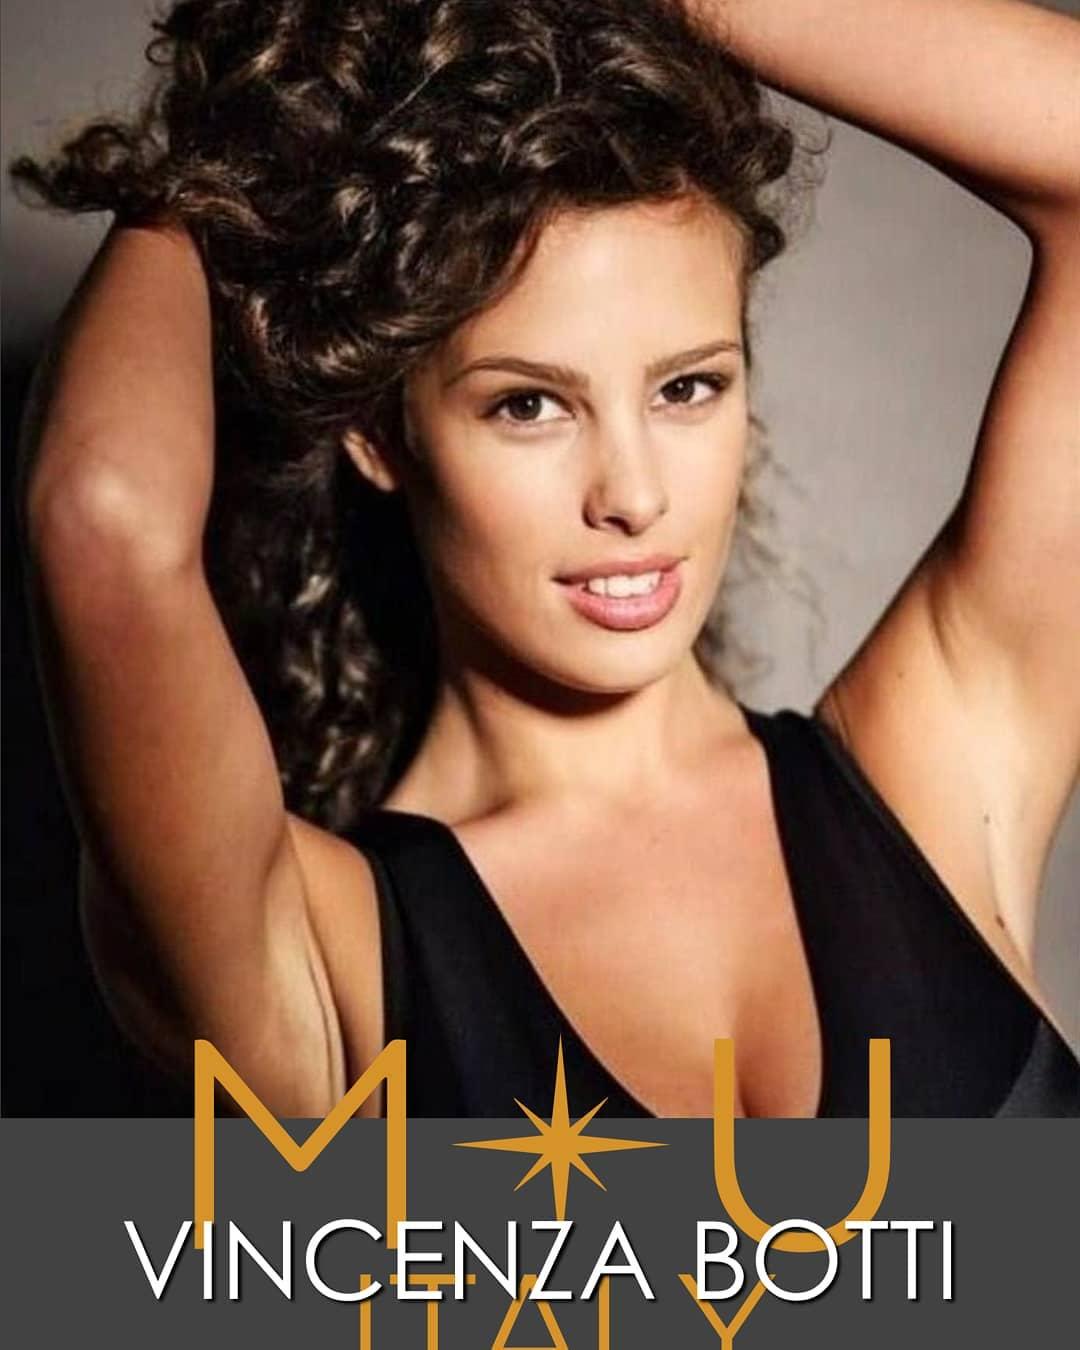 candidatas a miss universe italy 2020. final: 21 dec. - Página 3 Missuniverseitaly-124400164-1738963379603600-1940215203209202828-n